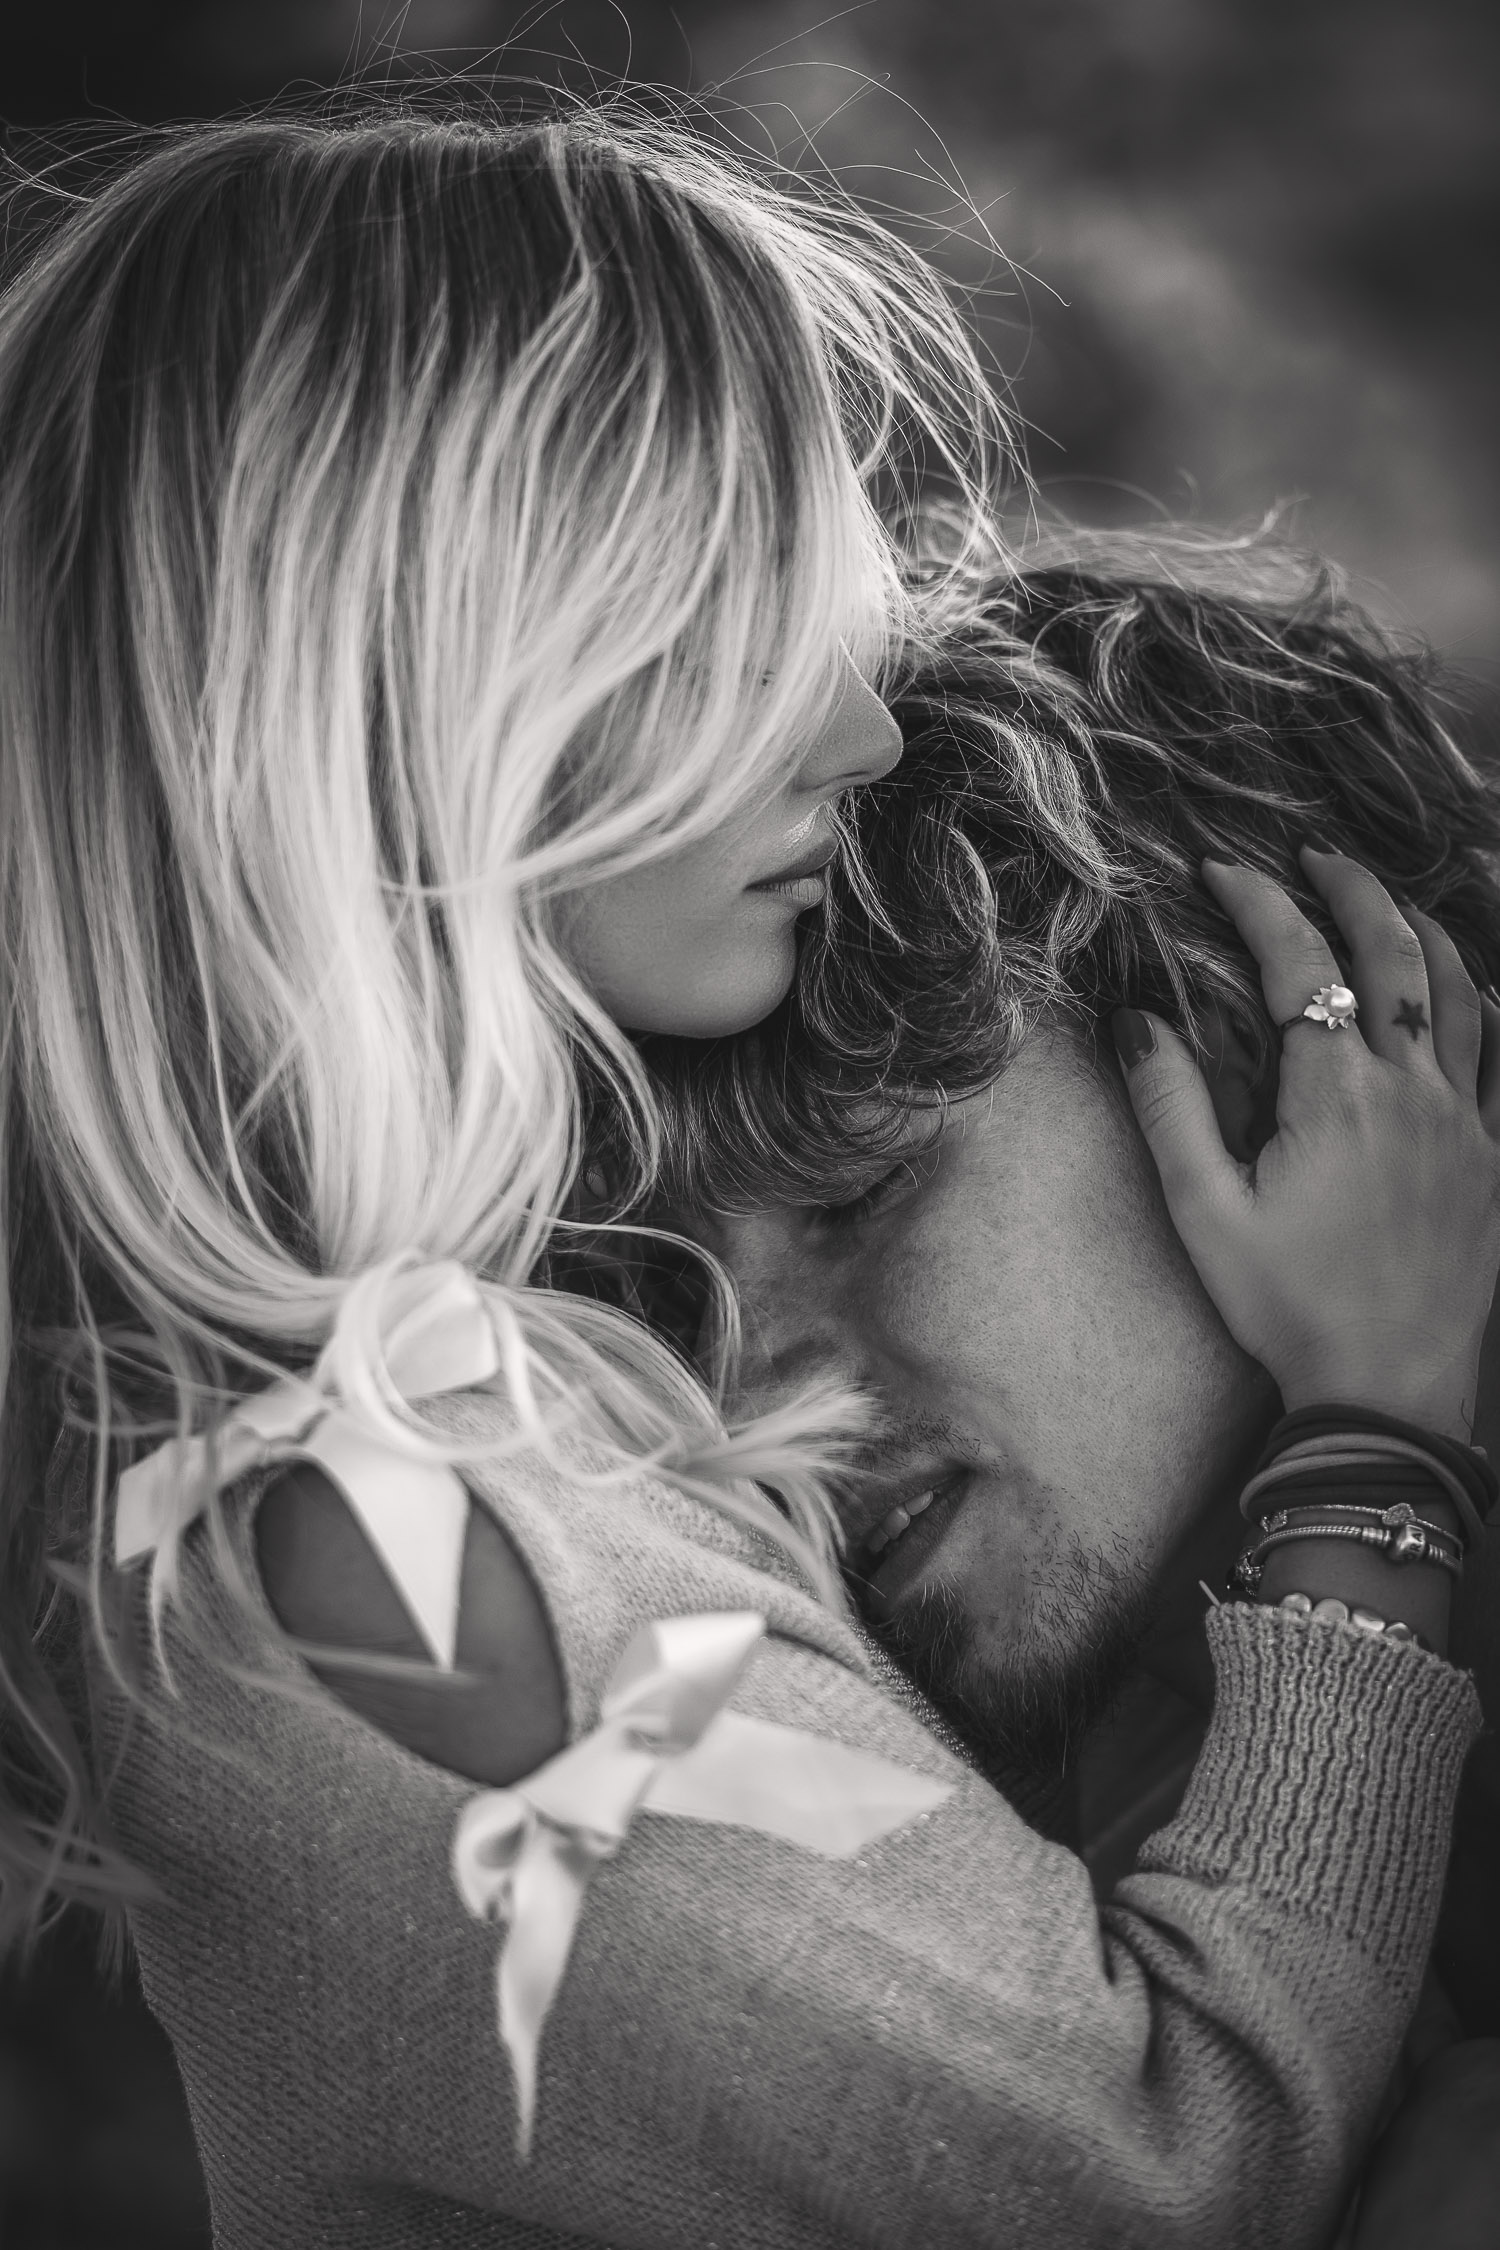 Paolo-Mantovan-Fotografo-Romantic-Engagement-Piemonte-Shooting-SanValentino2020-09